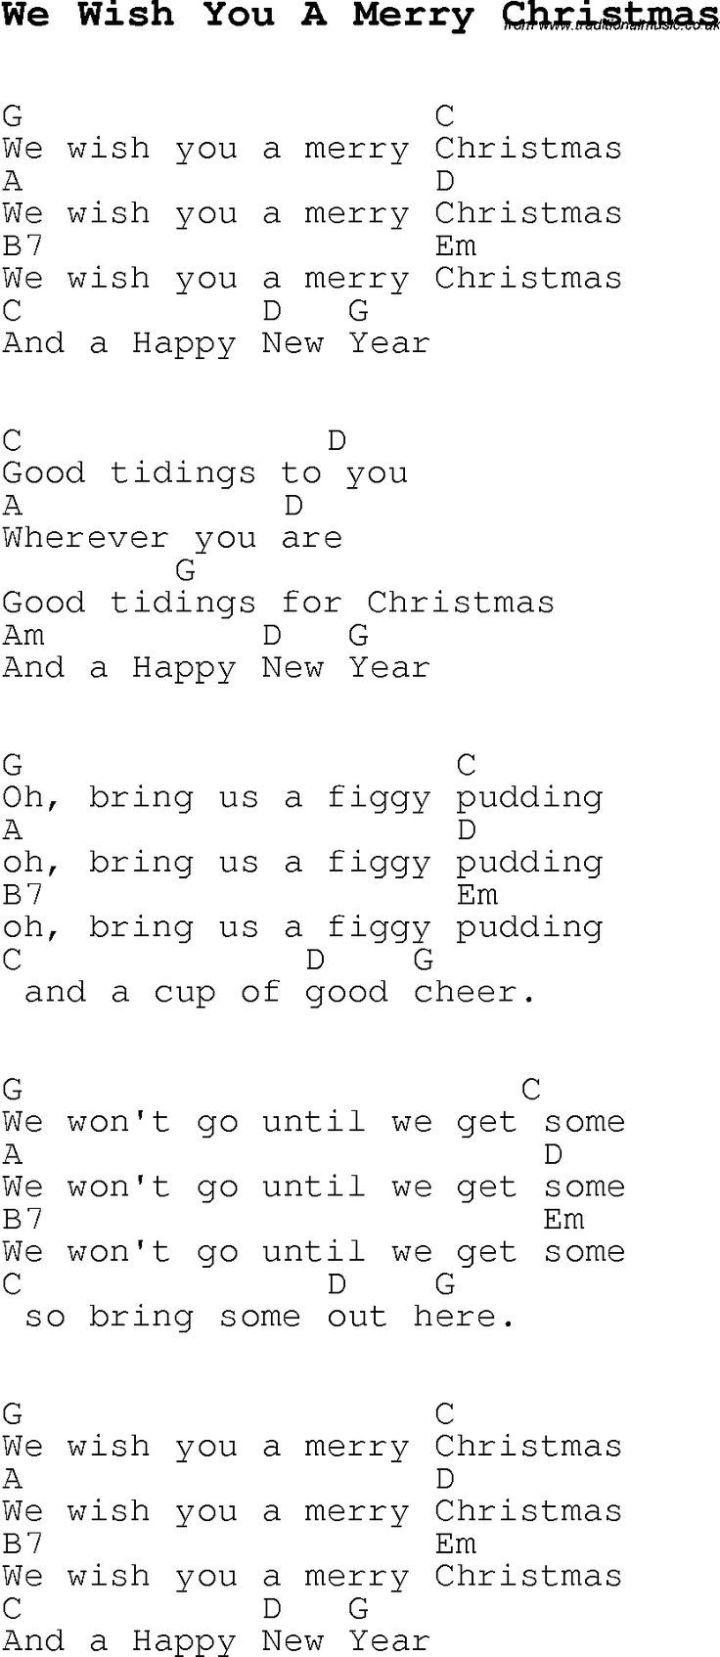 Christmas Songs And Carols Lyrics With Chords For Banjo Guitar For We Wish You Christmas Ukulele Songs Ukulele Songs Christmas Songs Lyrics